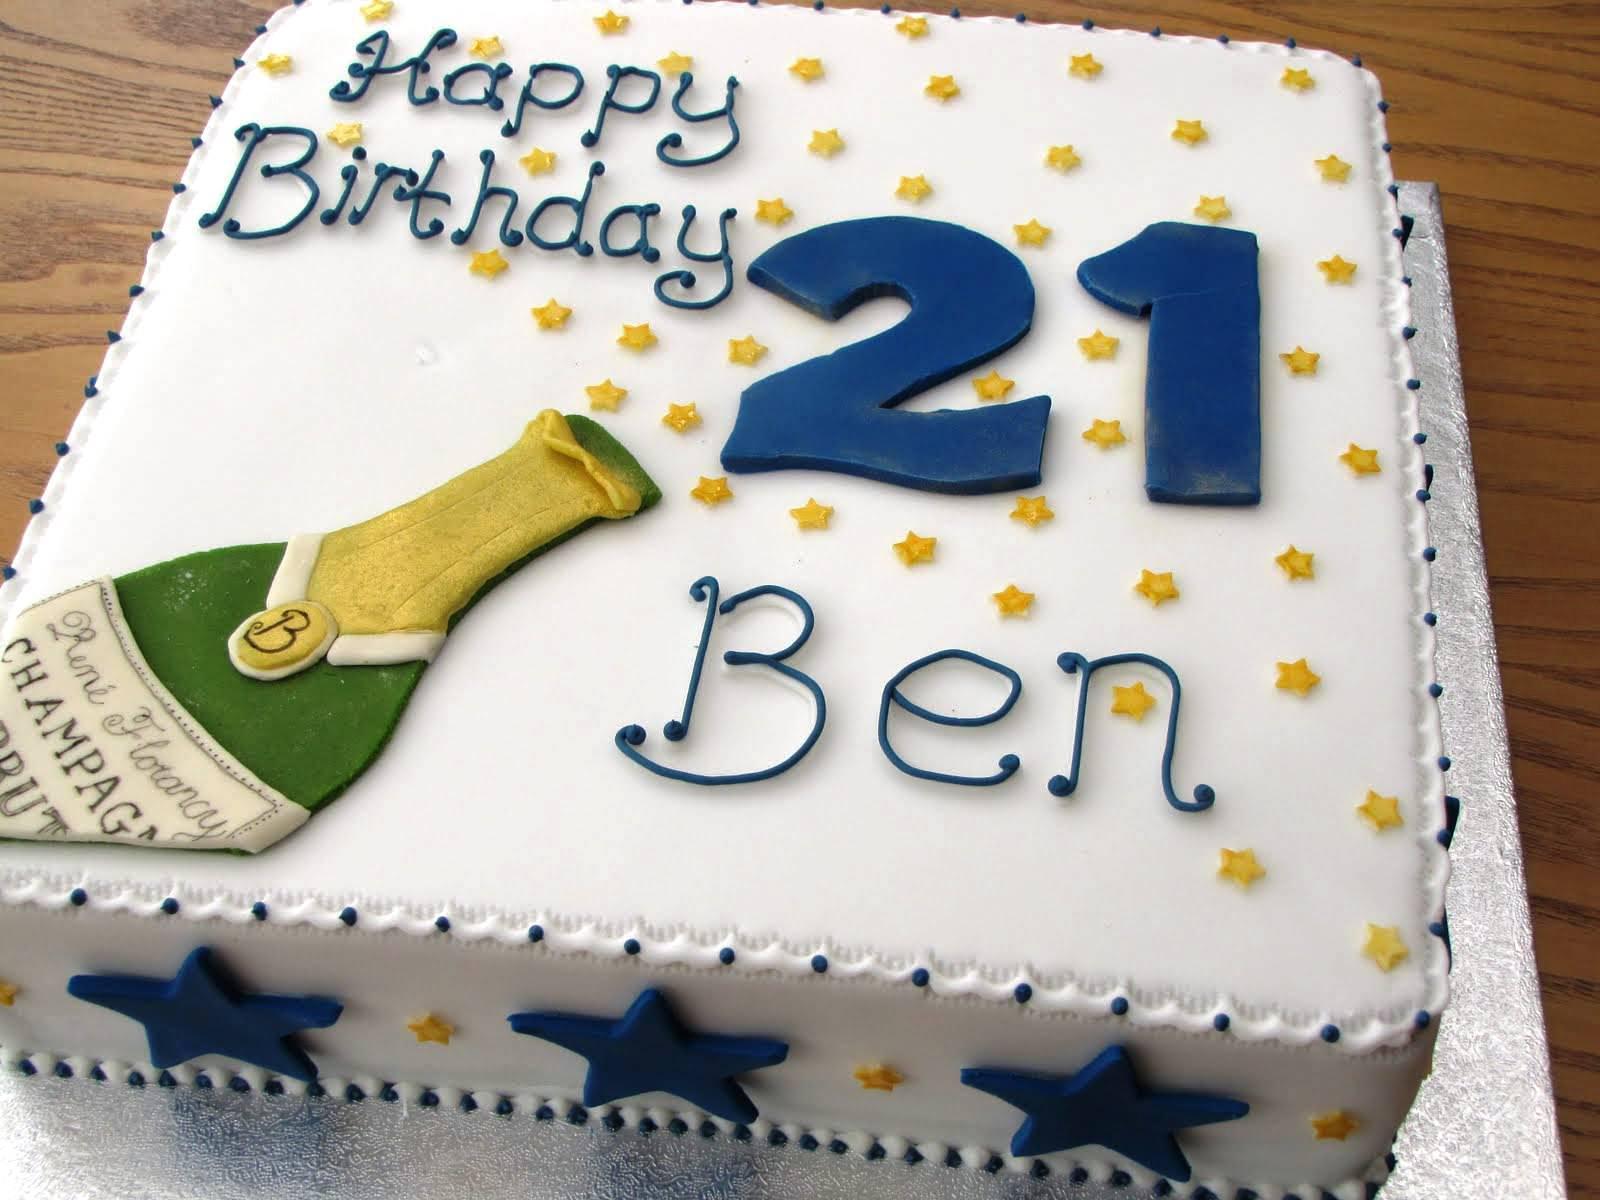 Remarkable Customise This Cake Source Male Birthday Cake Design 802478 Personalised Birthday Cards Beptaeletsinfo